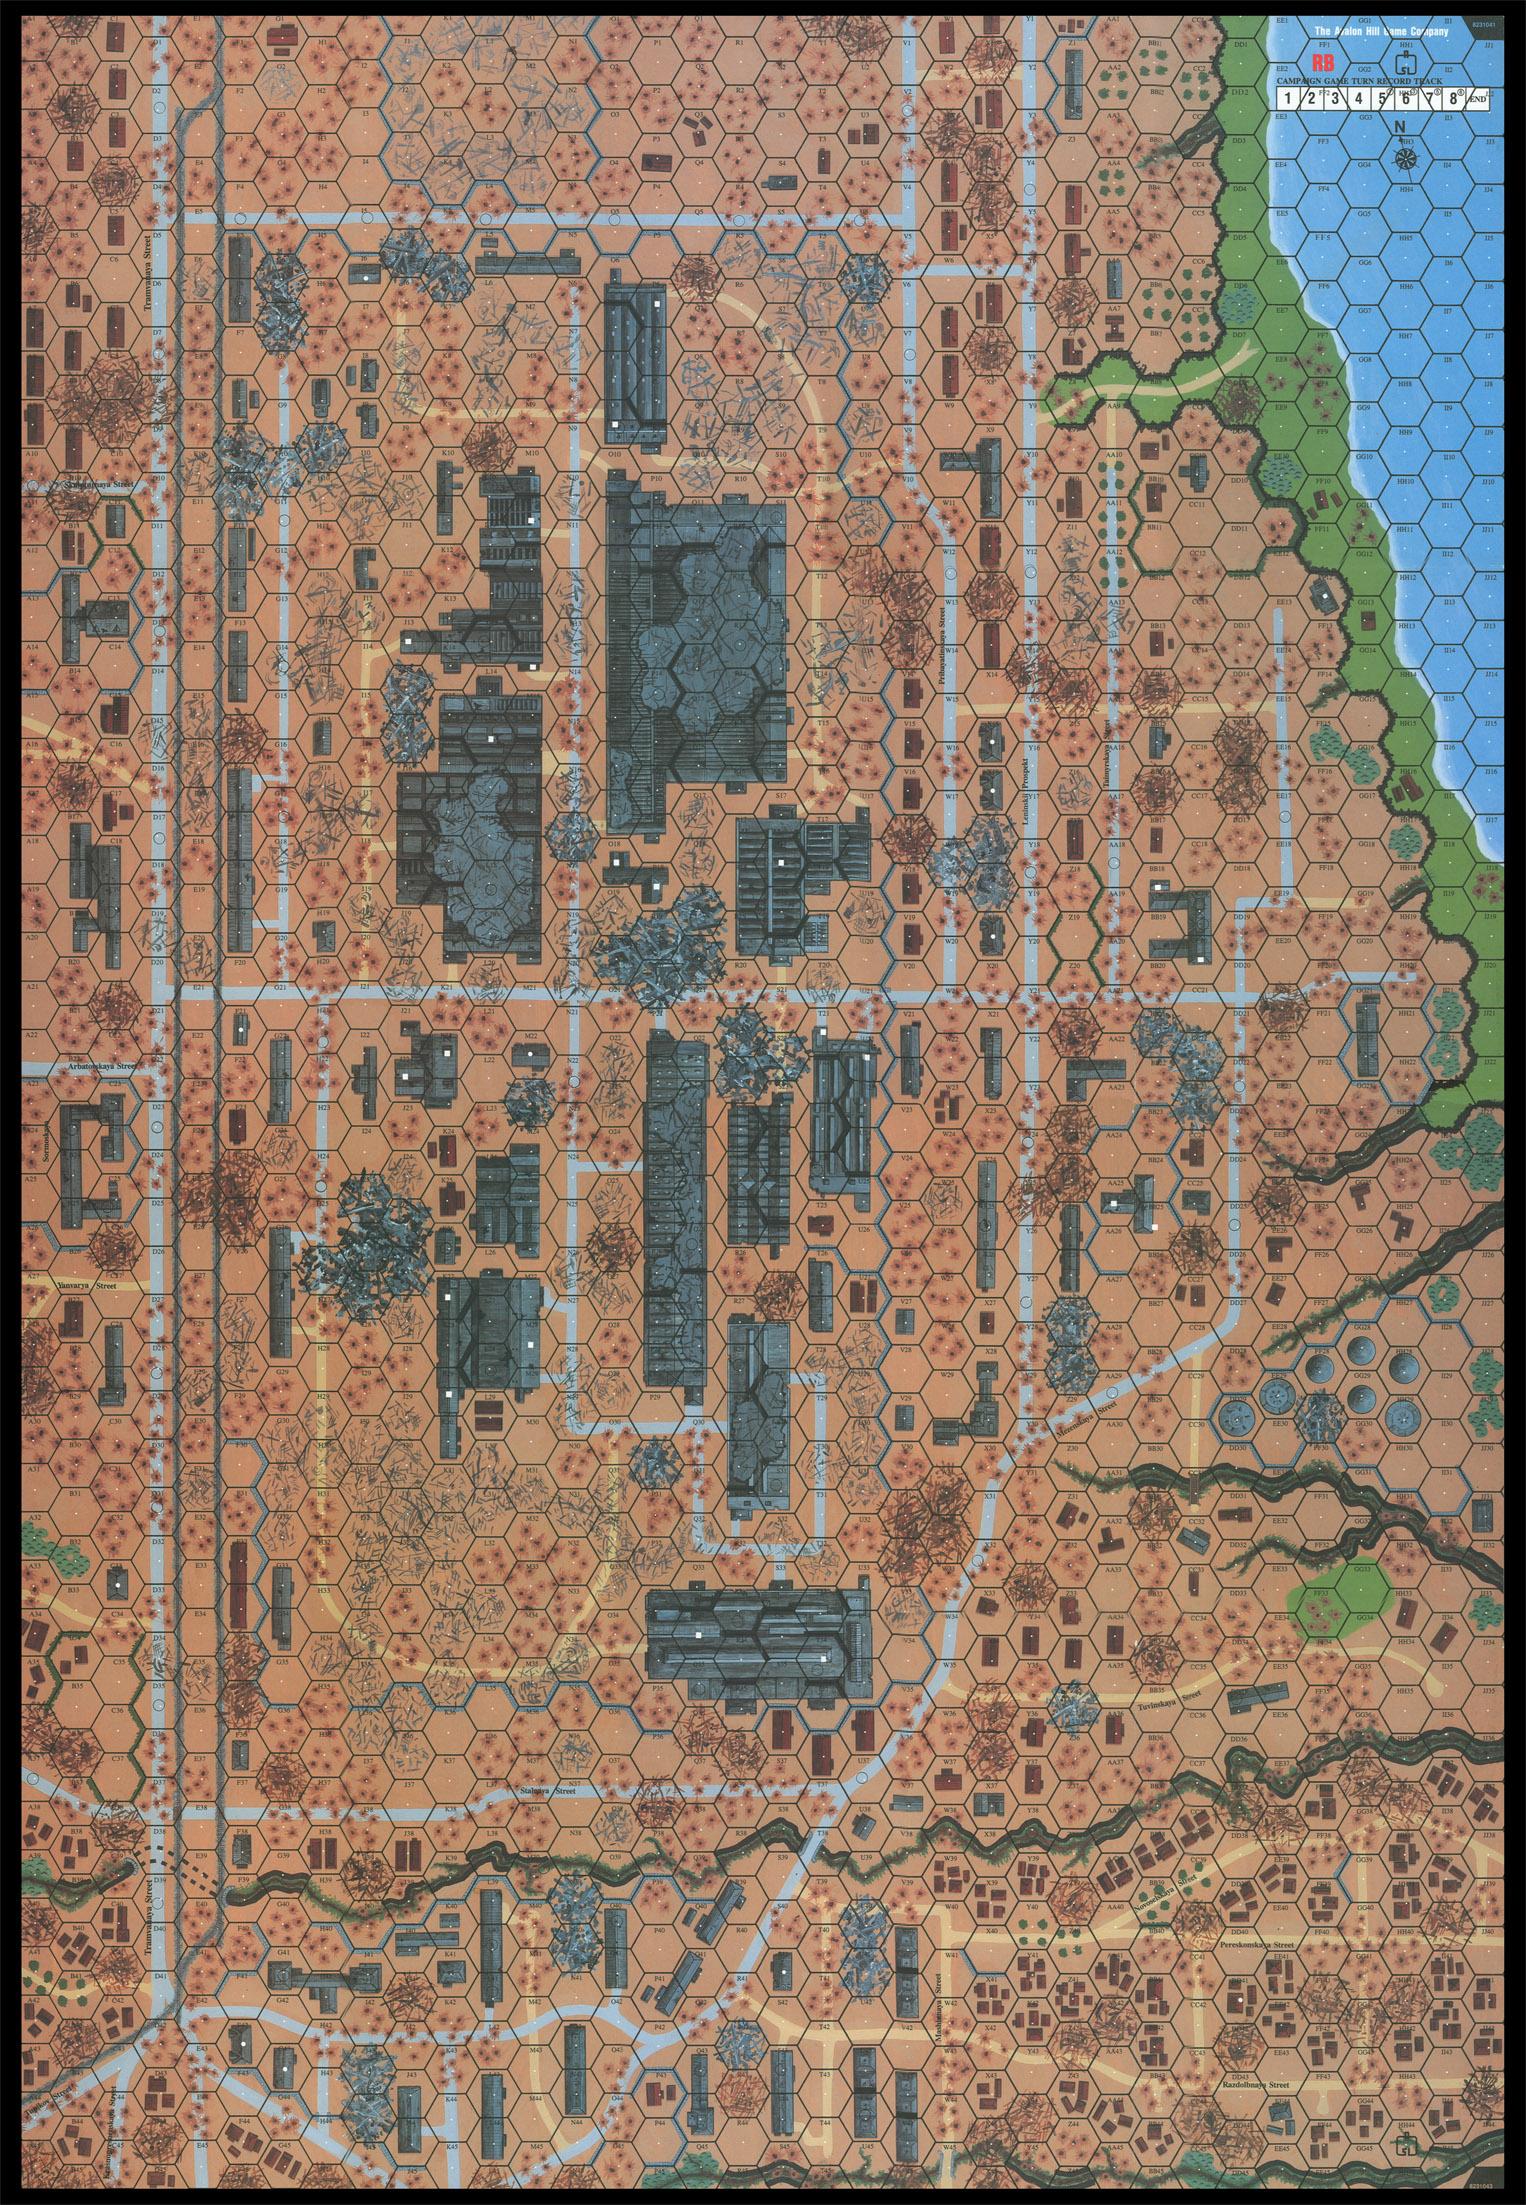 Red Barricades A4 200 dpi.jpg